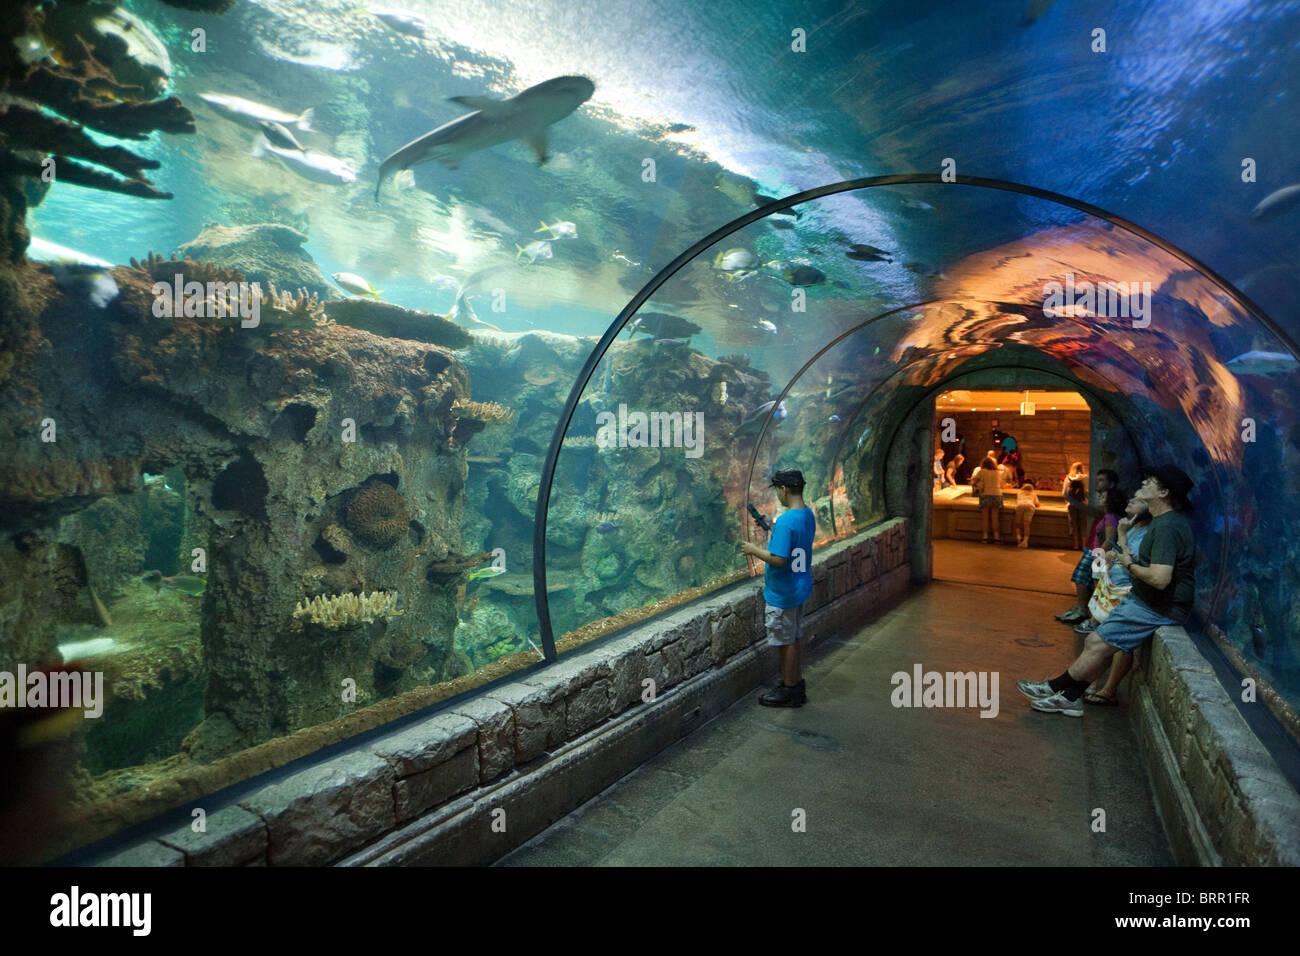 Les gens dans le tunnel des requins, regardant le Shark Reef Aquarium, l'hôtel Mandalay Bay, à Las Photo Stock